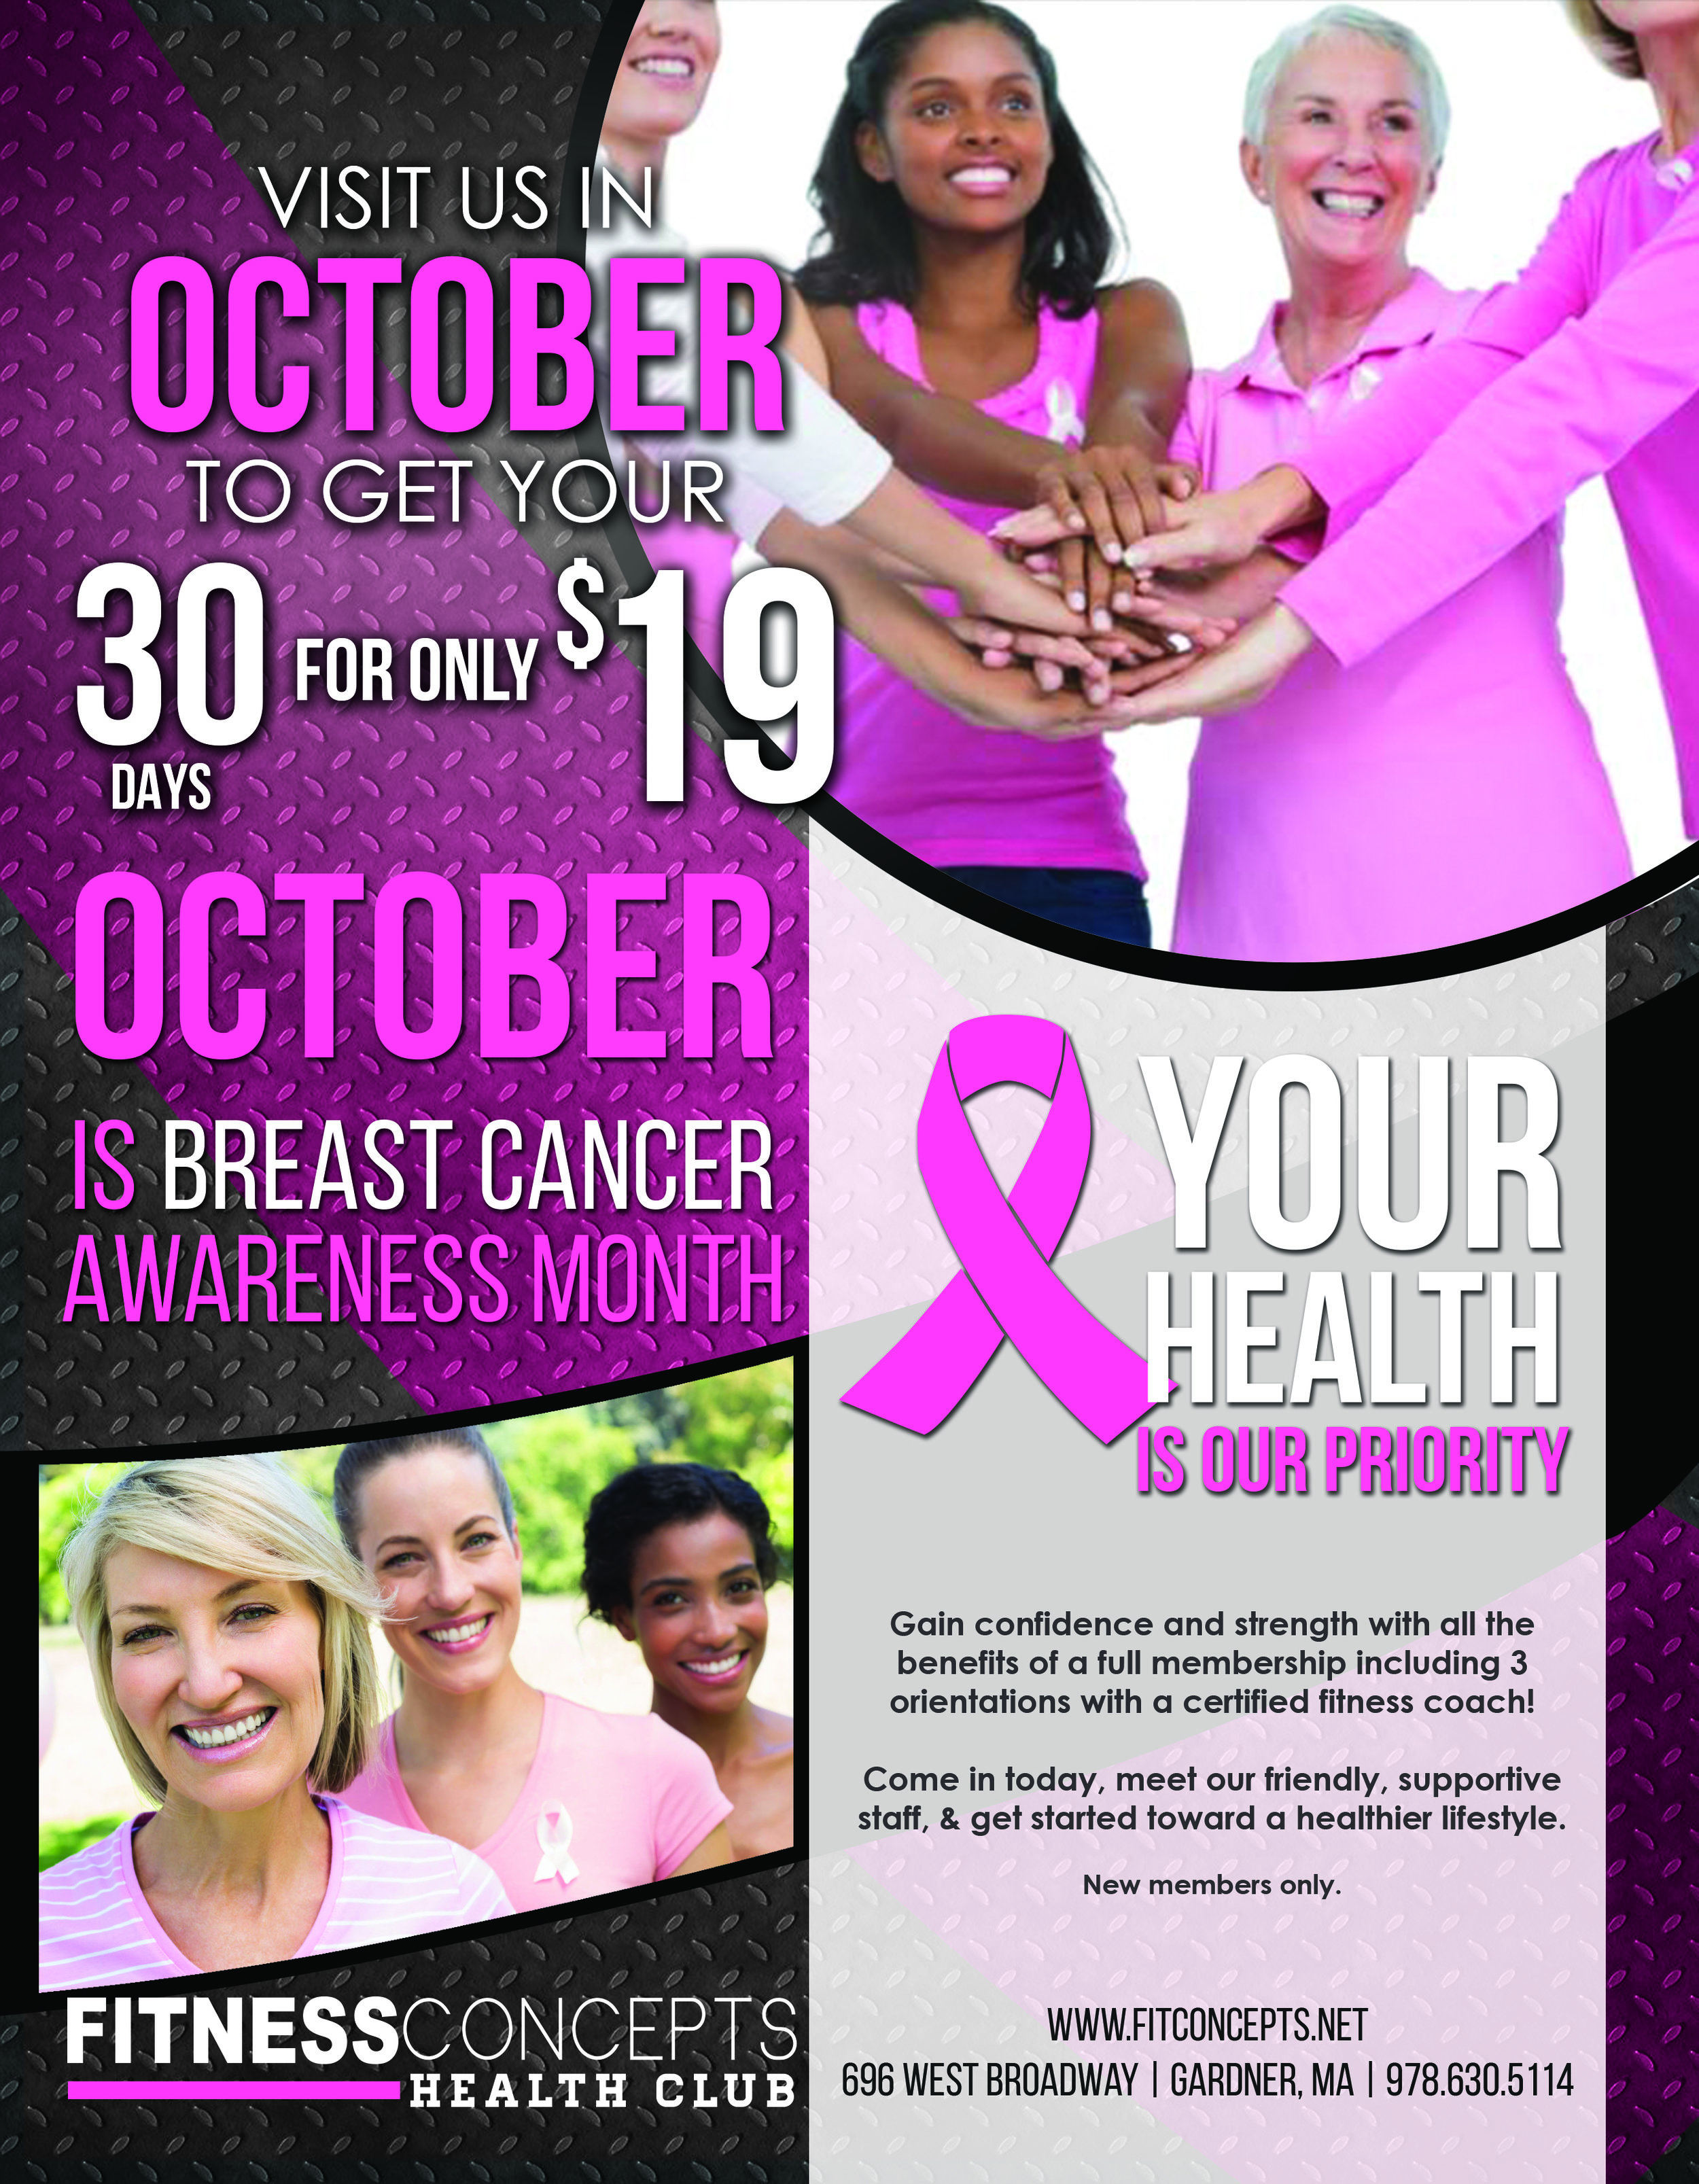 breastcancer_awareness_month.jpg